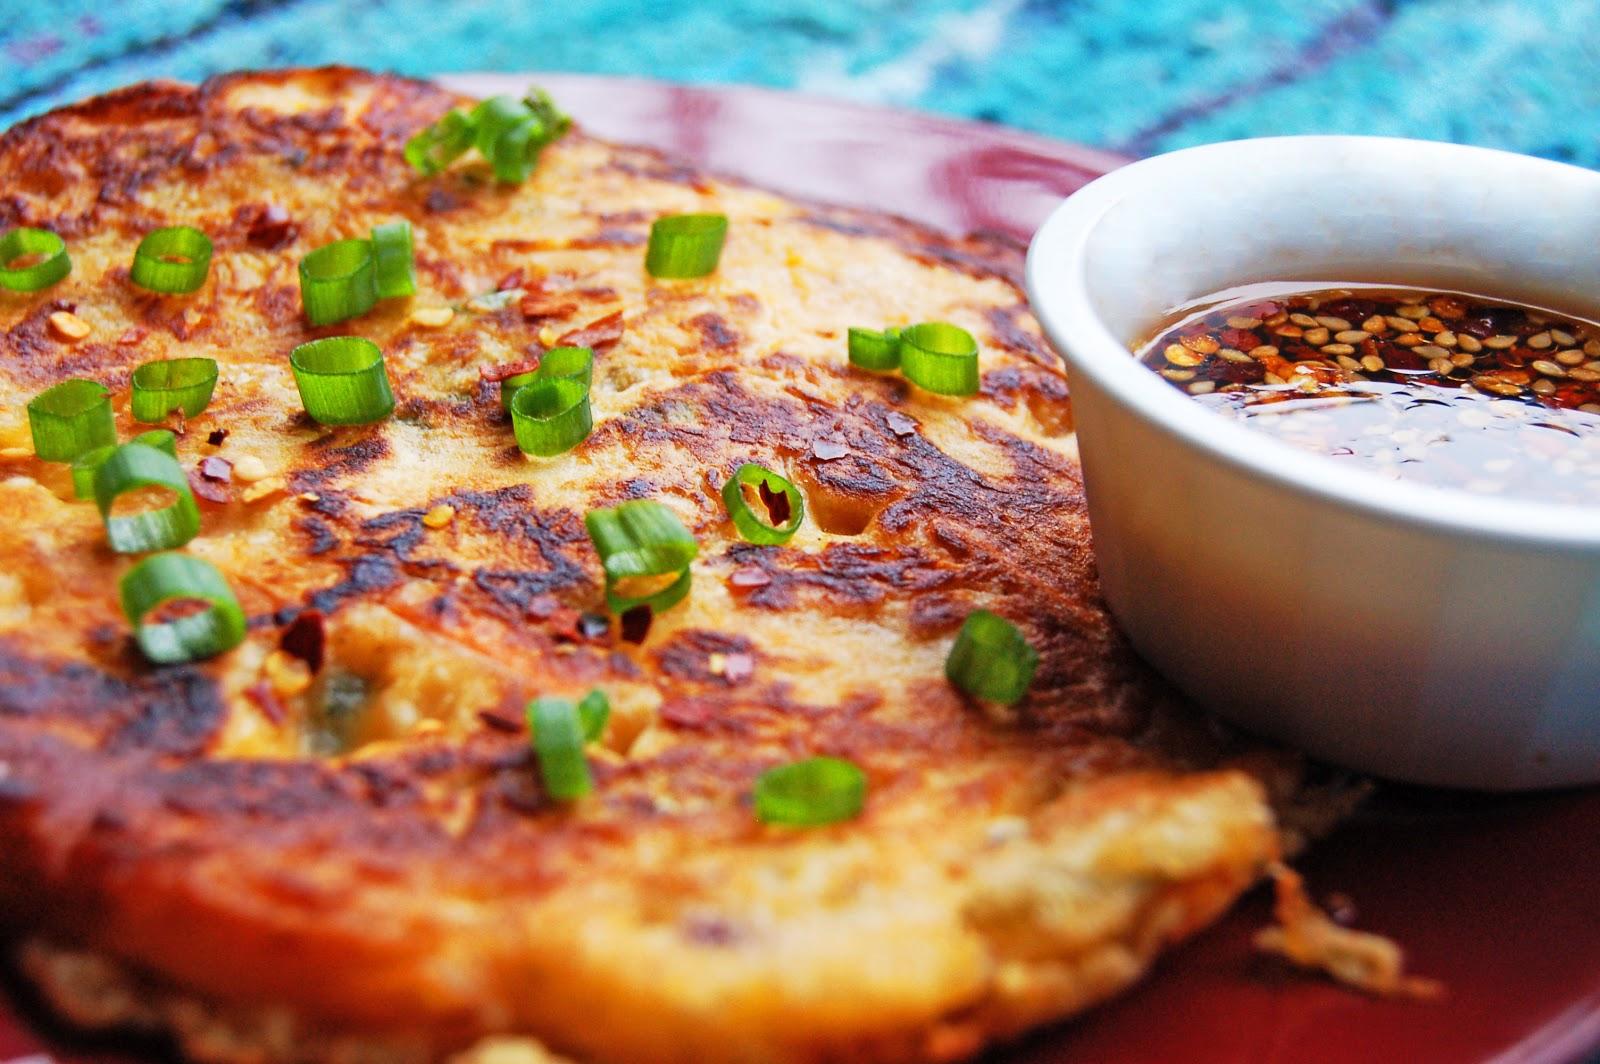 The Spice Island: Kimchijeon (Korean Kimchi Pancakes)